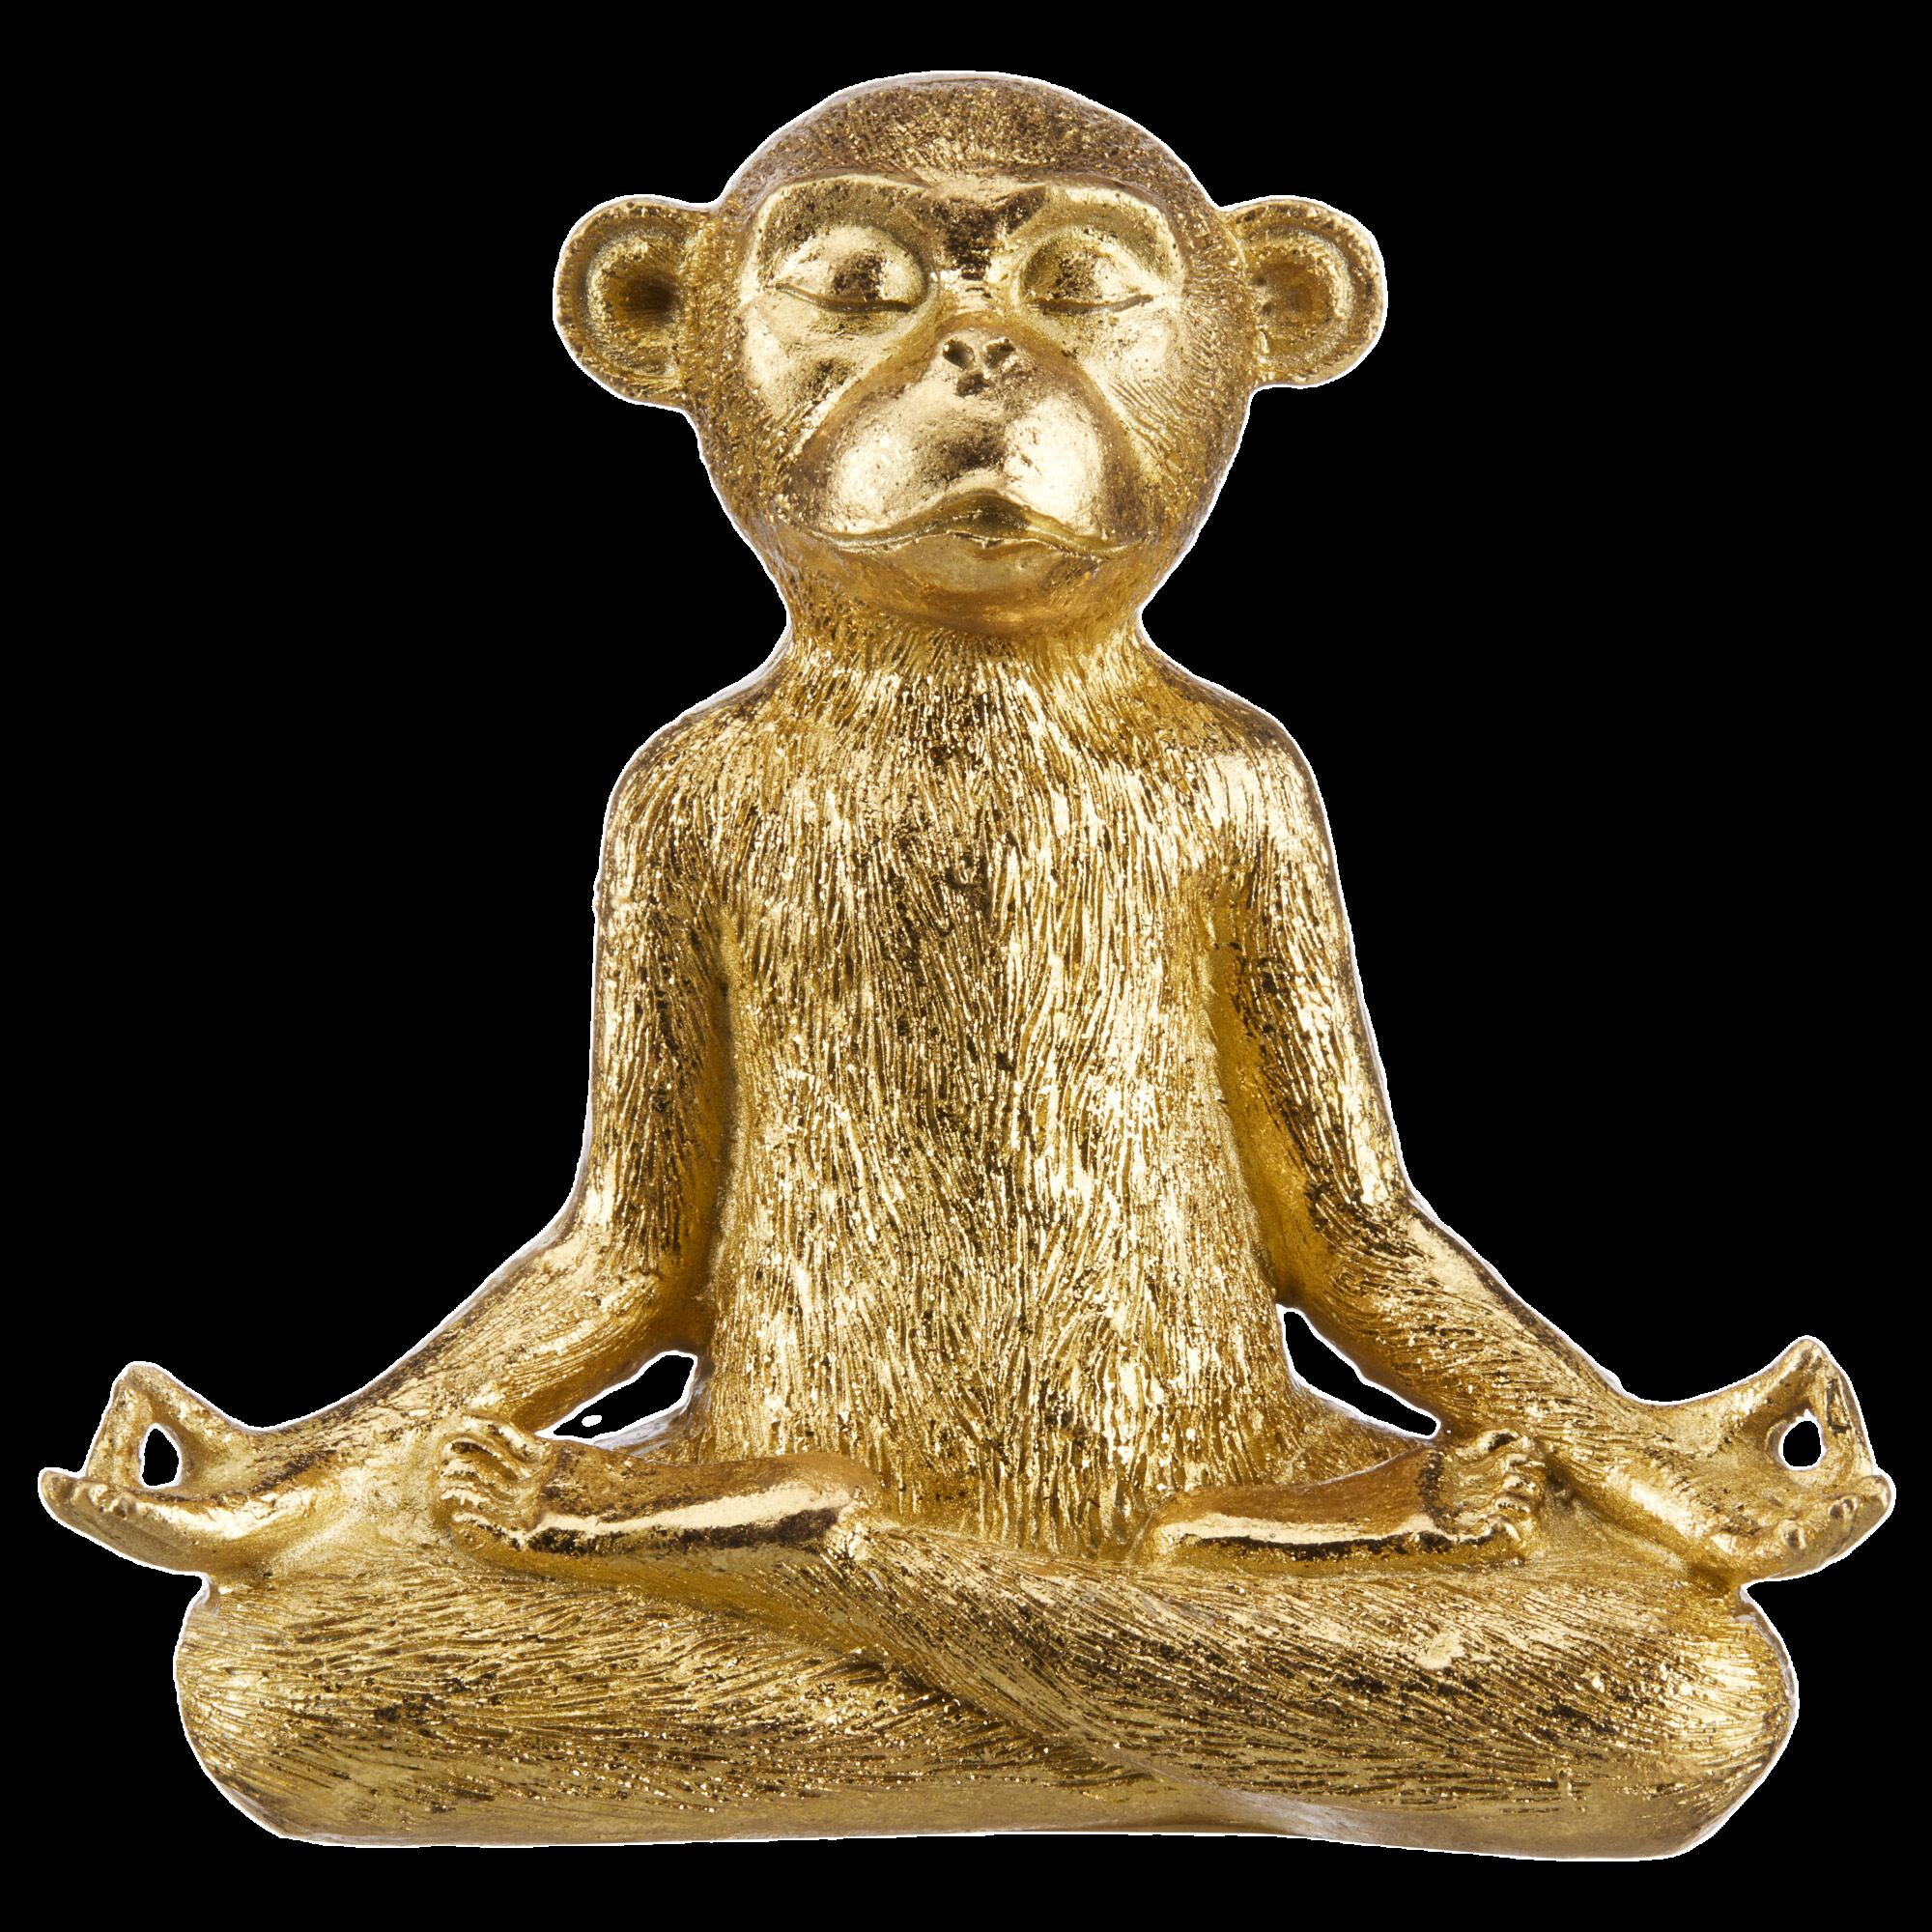 Meditating Monkey Decorative Statue